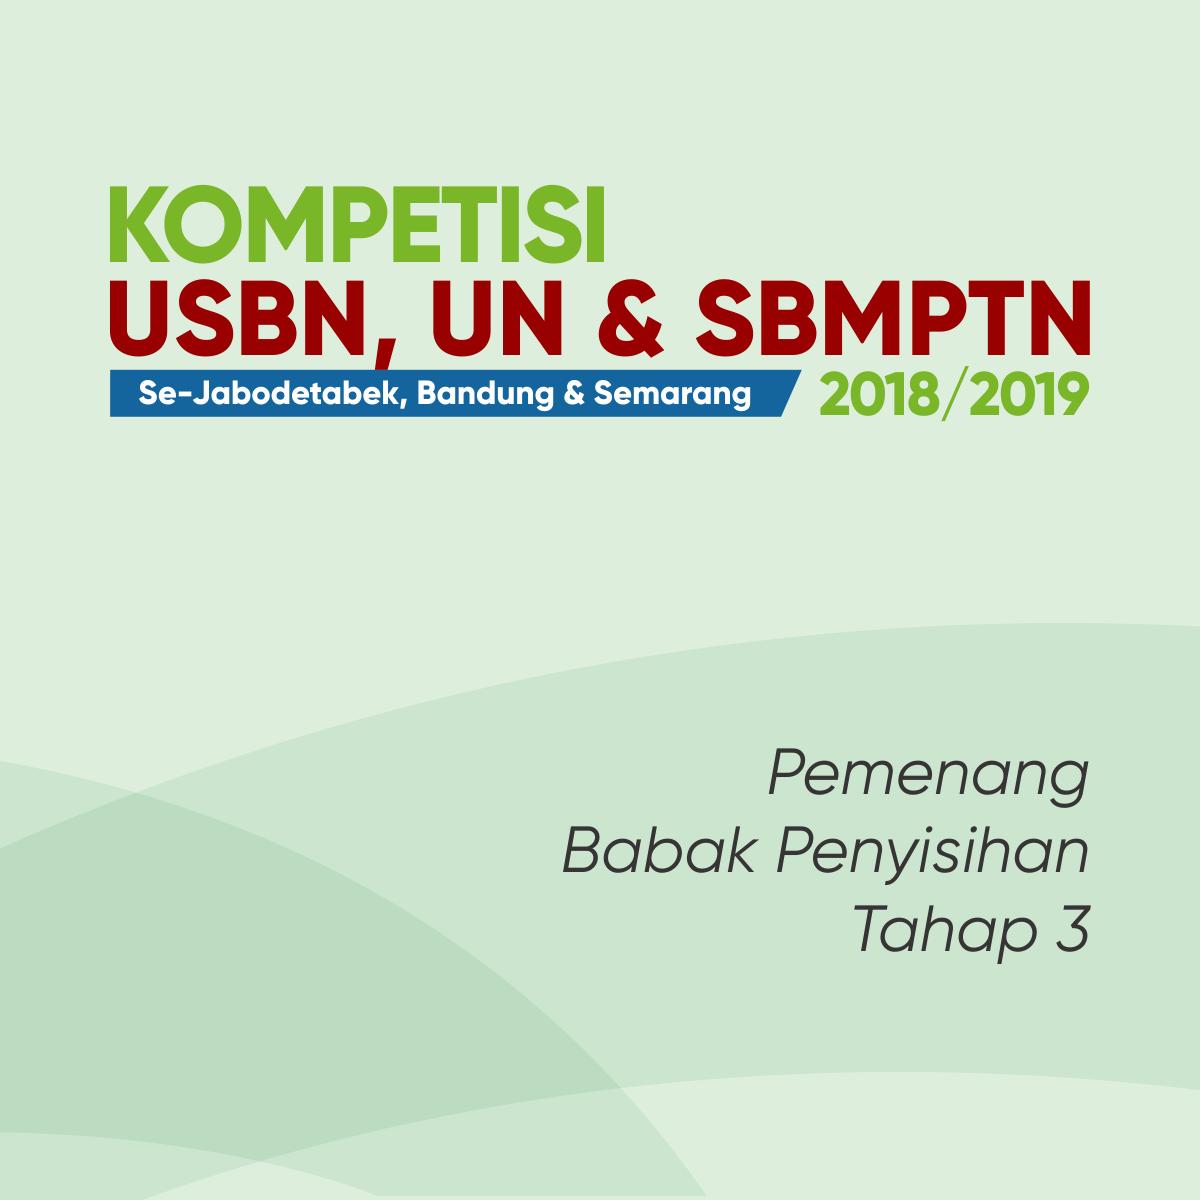 [Tahap 3] – Pemenang Babak Penyisihan Kompetisi USBD, UN, & SBMPTN Se-Jabodetabek, Bandung dan Semarang